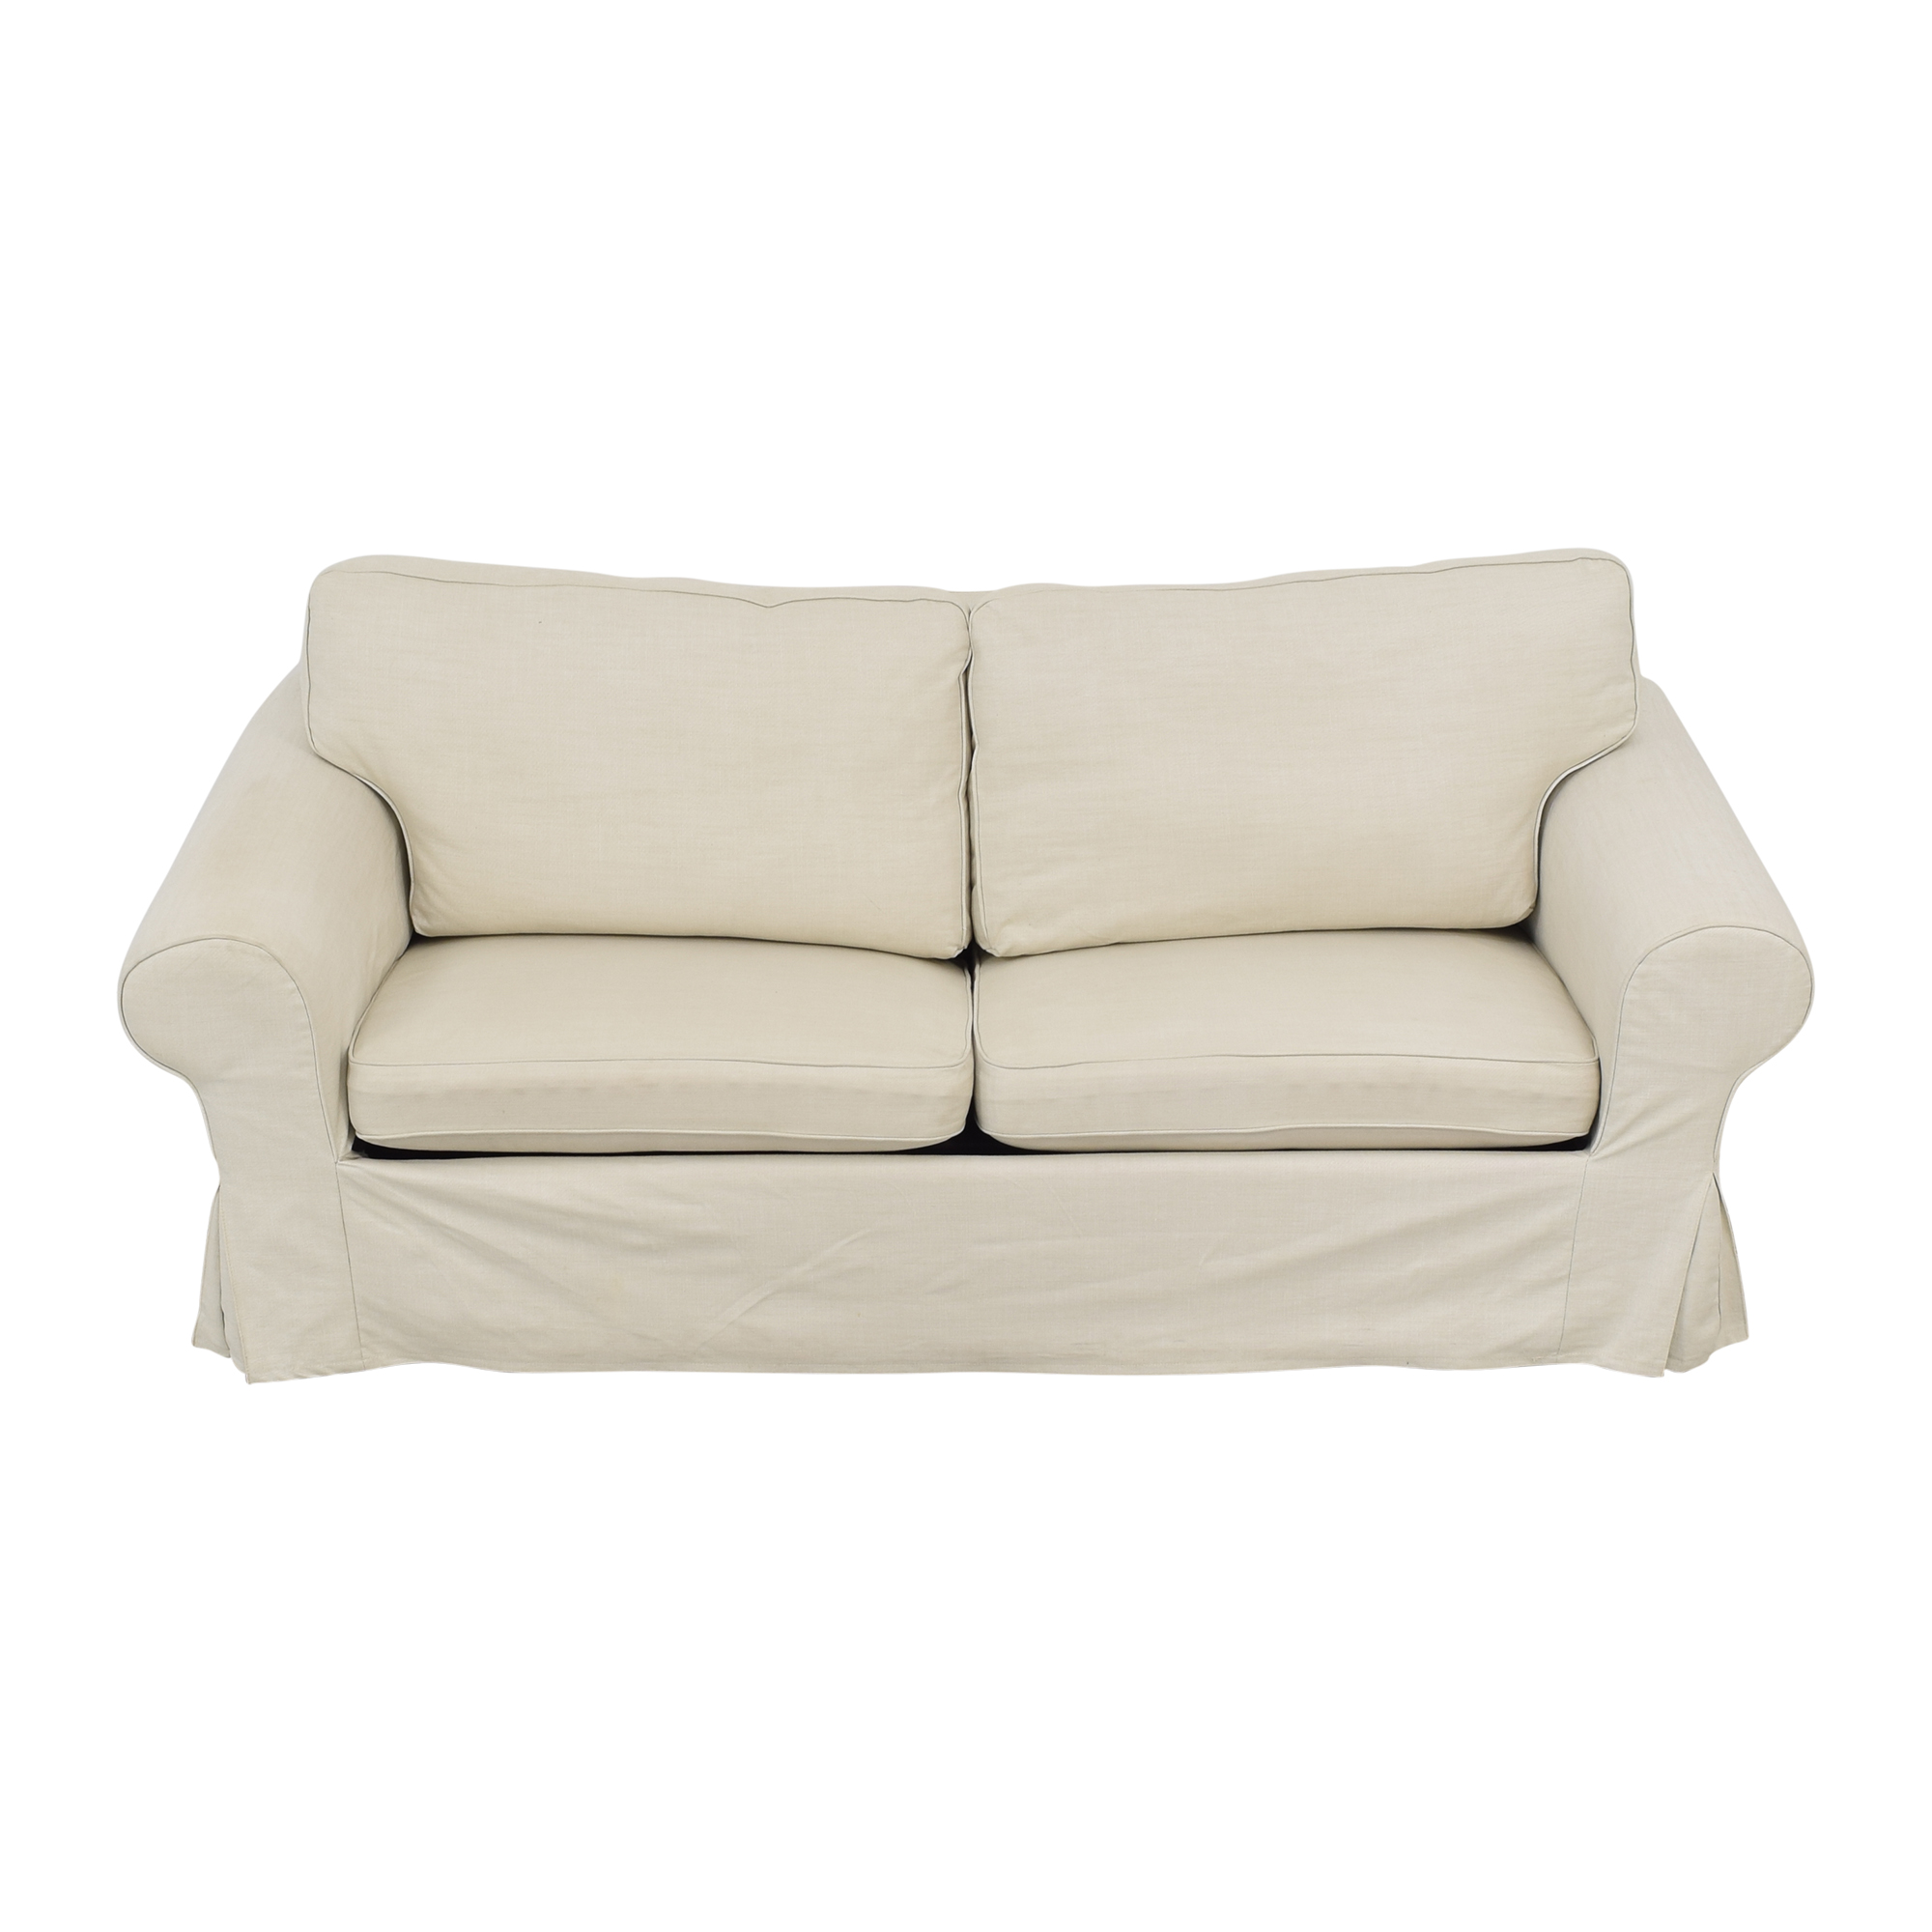 IKEA Ikea Ektorp Sofa Bed ma